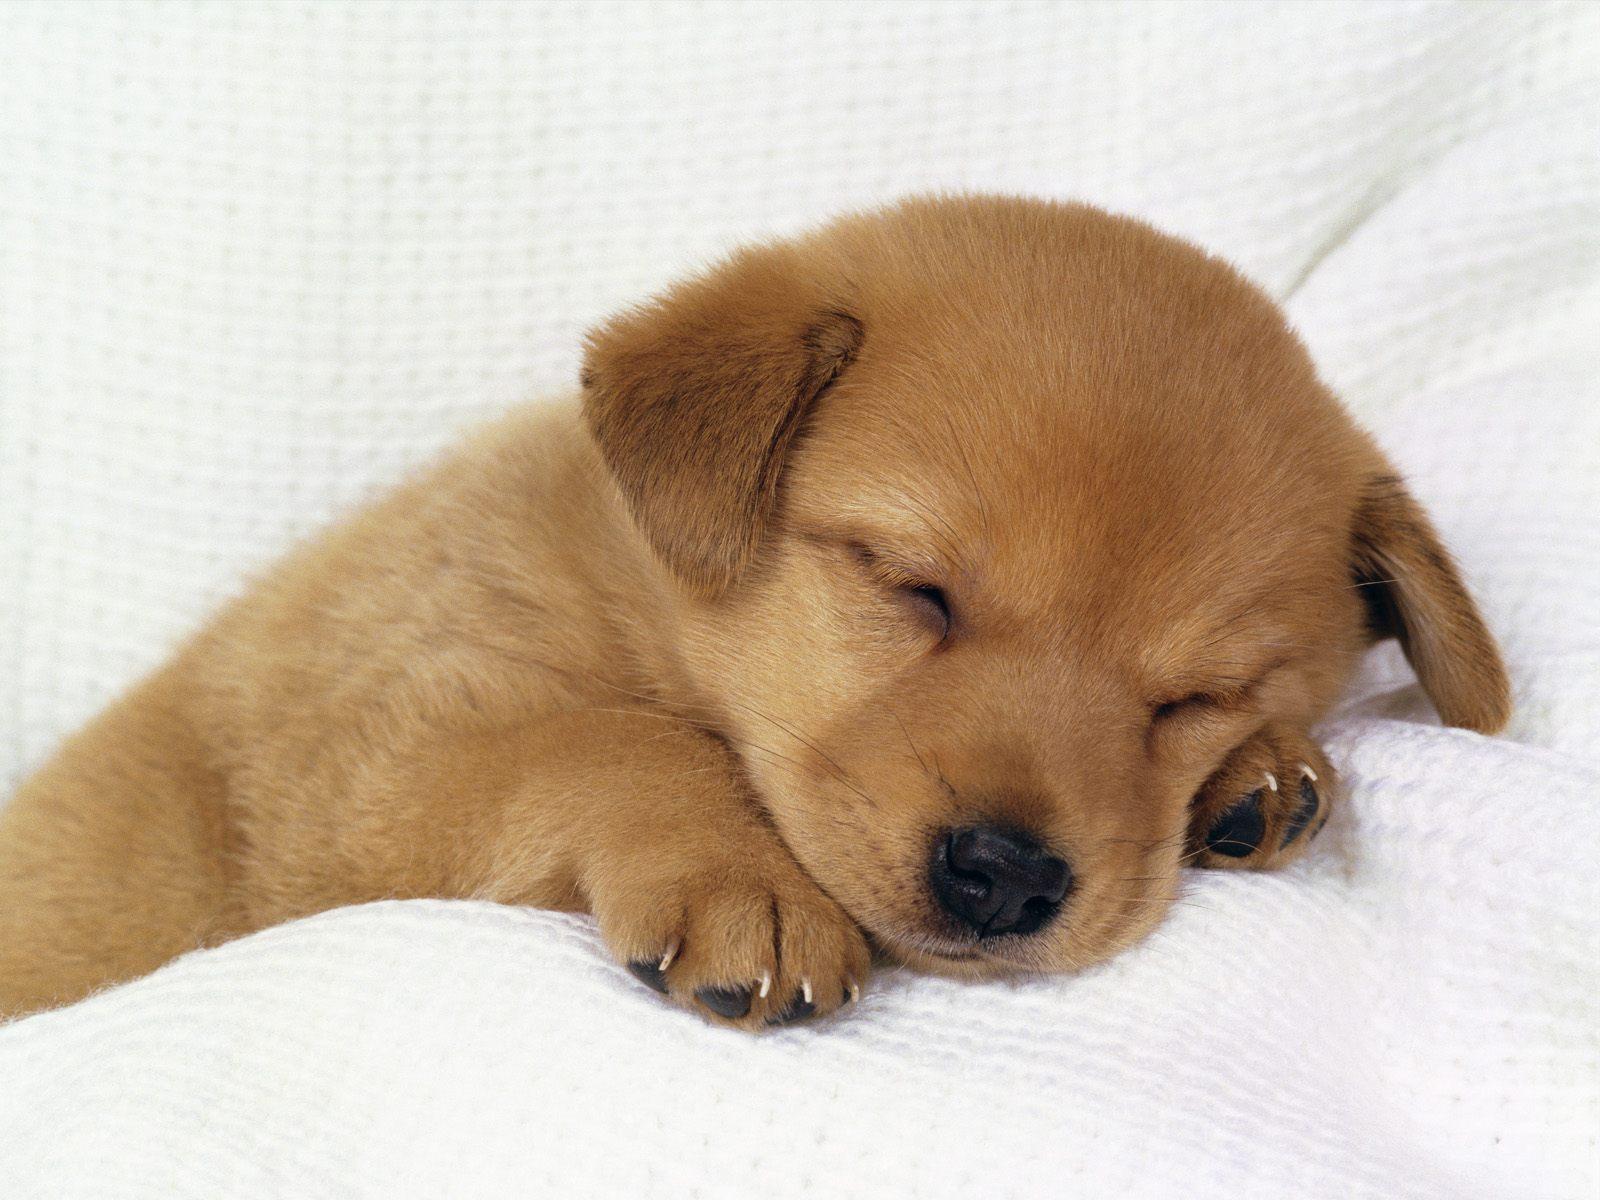 ... , cute puppy wallpaper , funny dog wallpaper , hd cute dog wallpaper